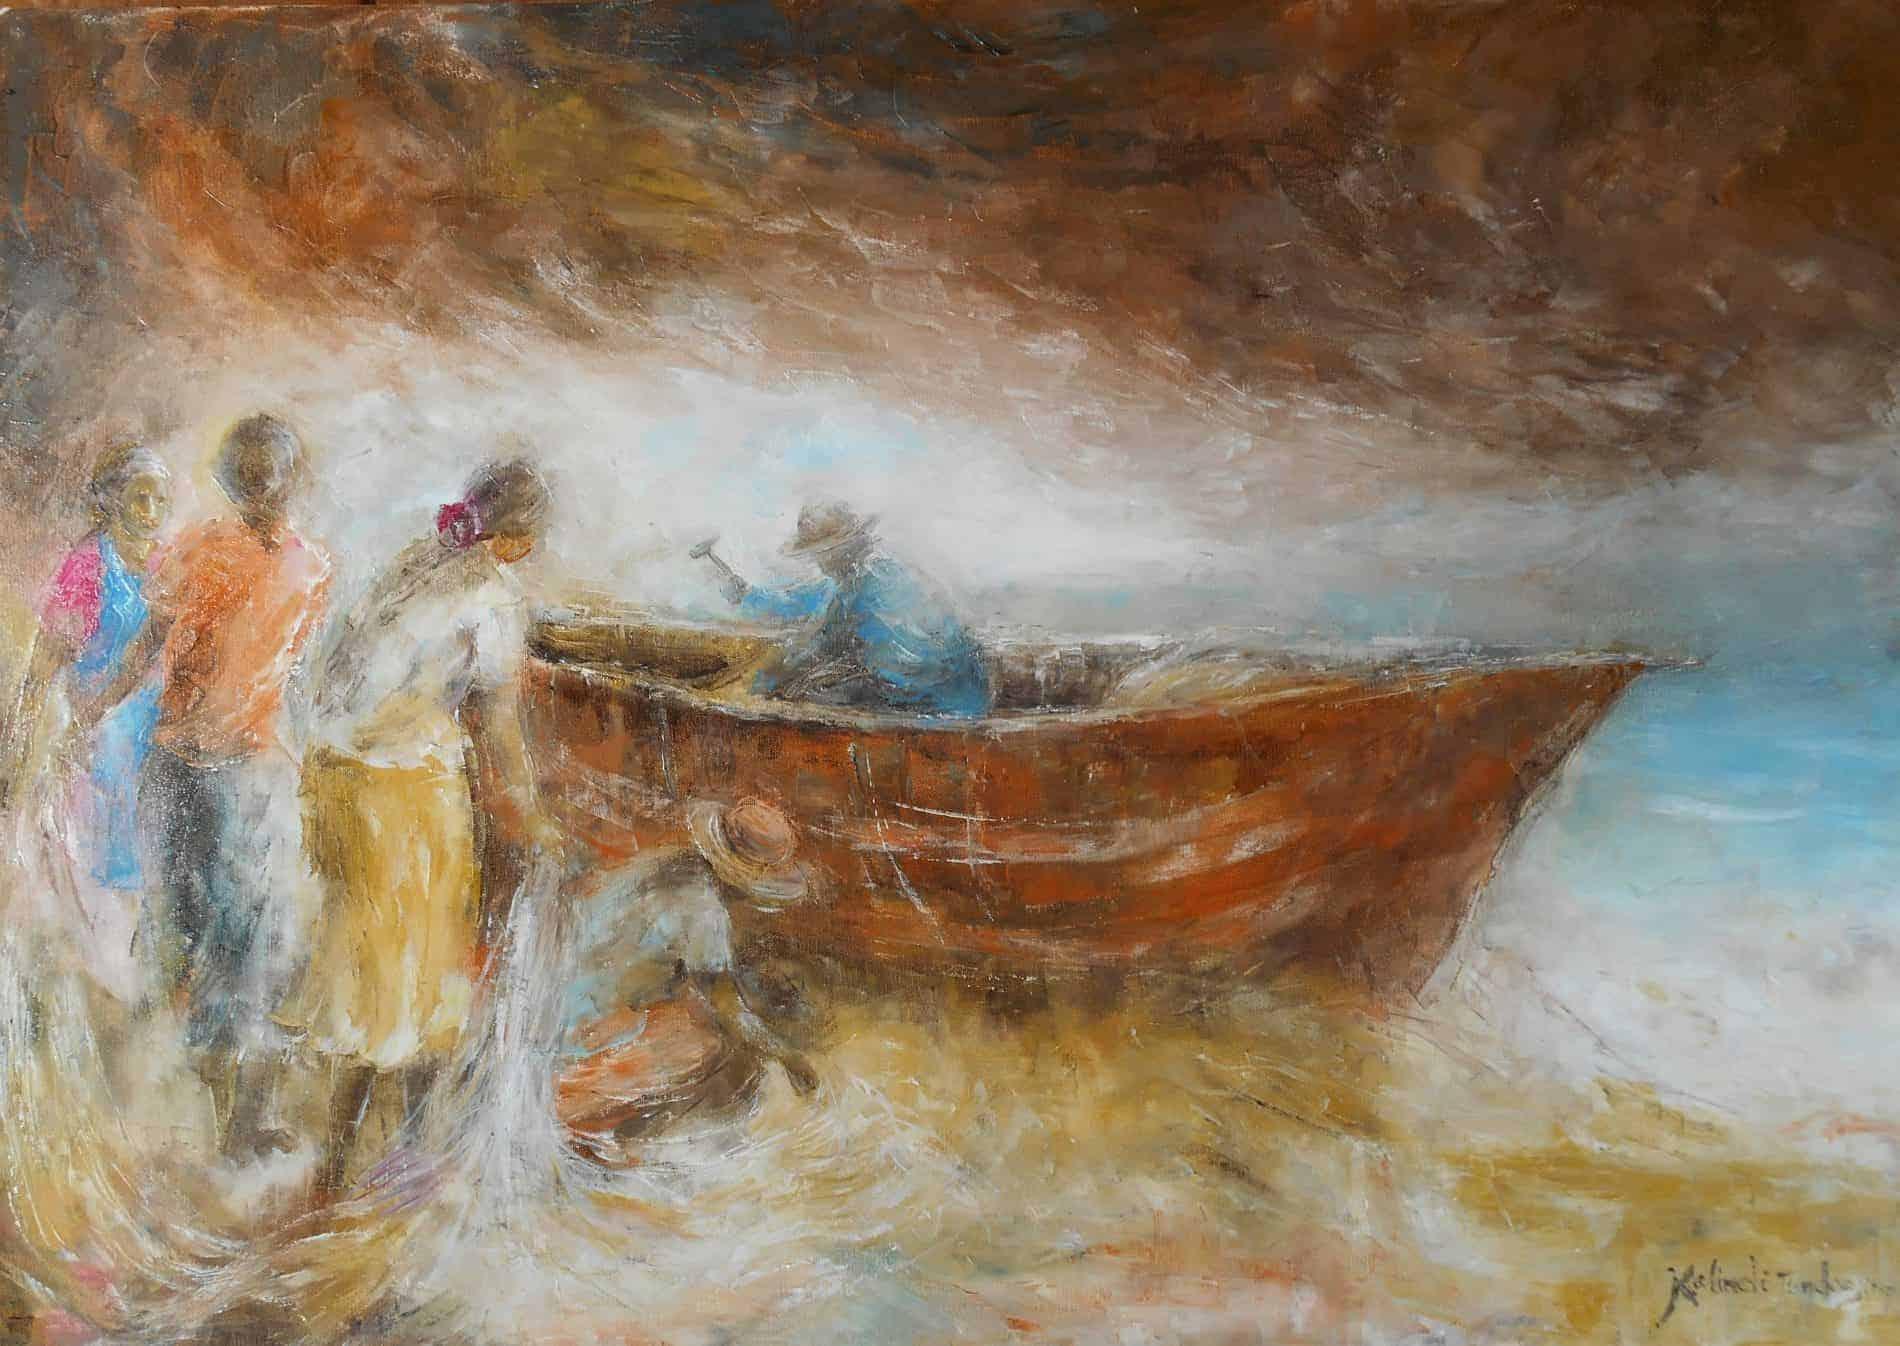 Mauritius Arts & Artists - mauiritius-arts-kalindi-jundoosing-beforethecyclone